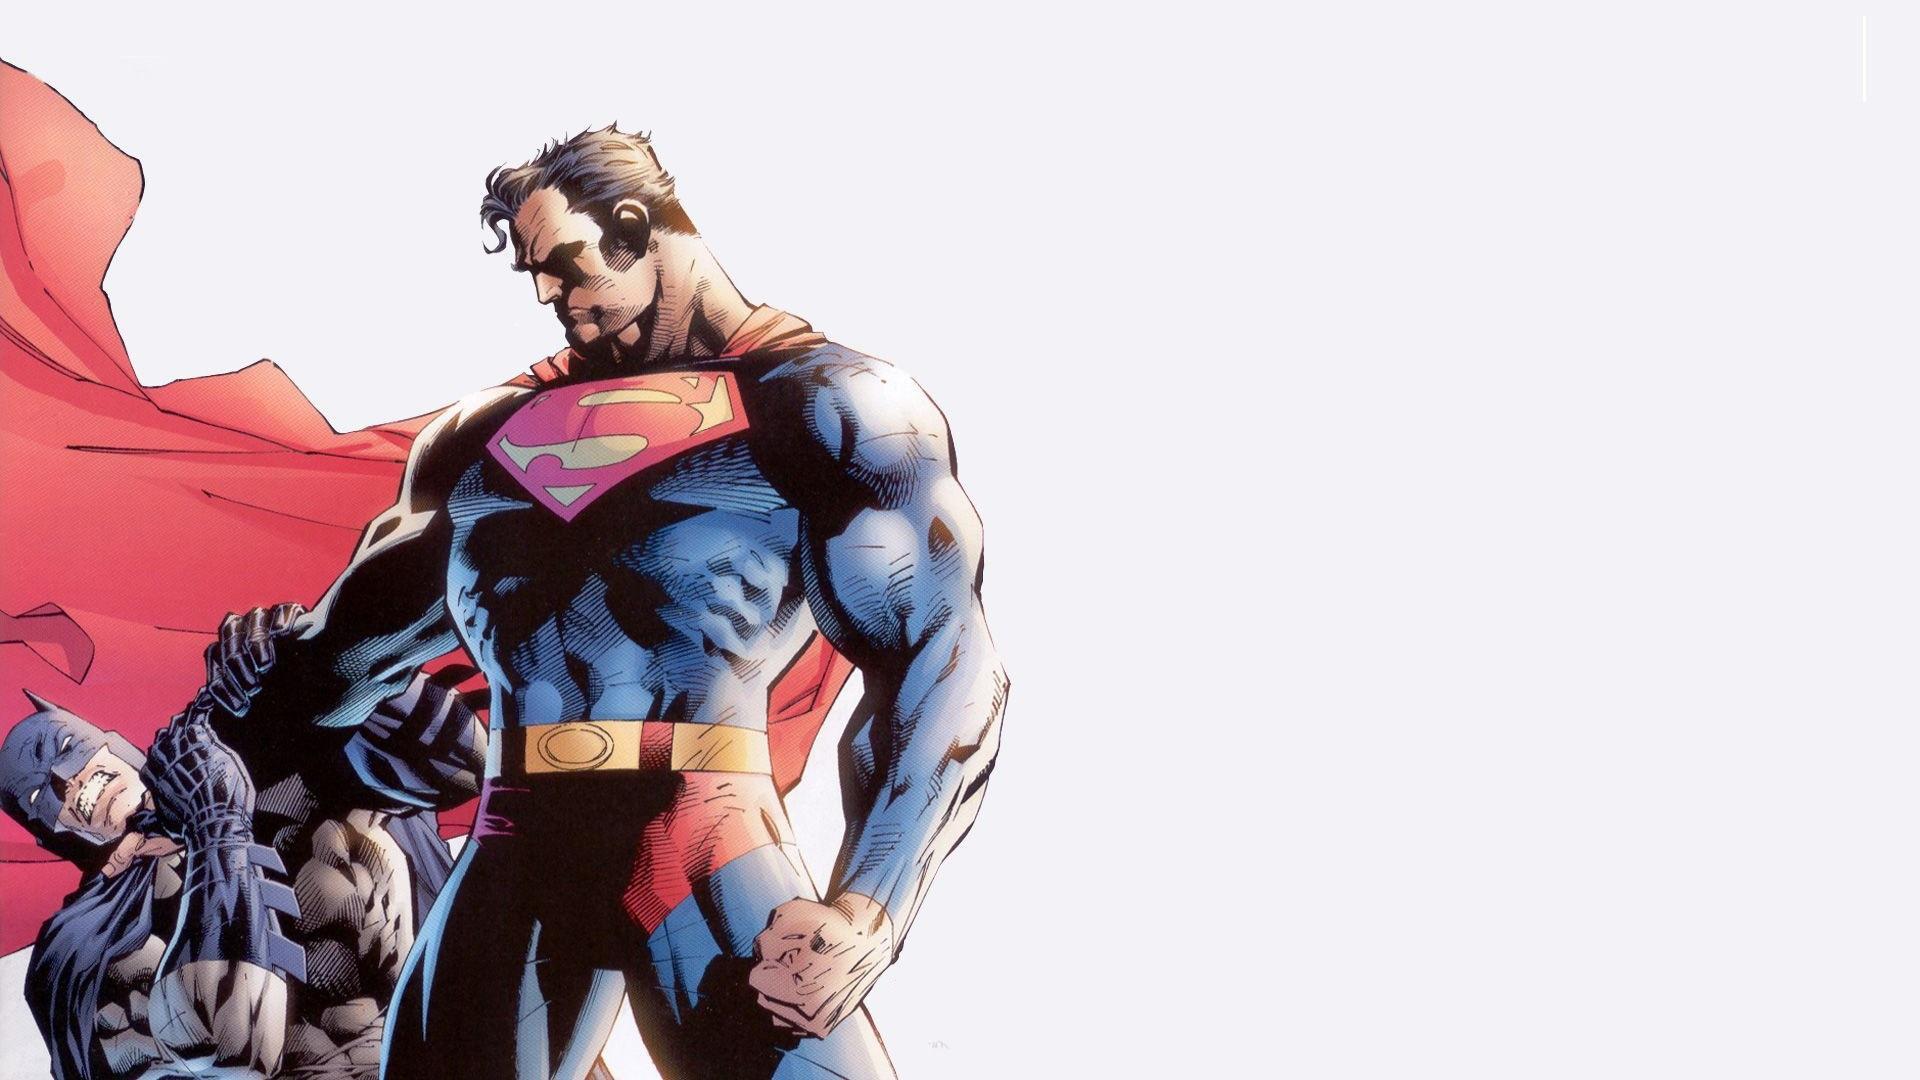 Batman VS. Superman wallpapers HD quality